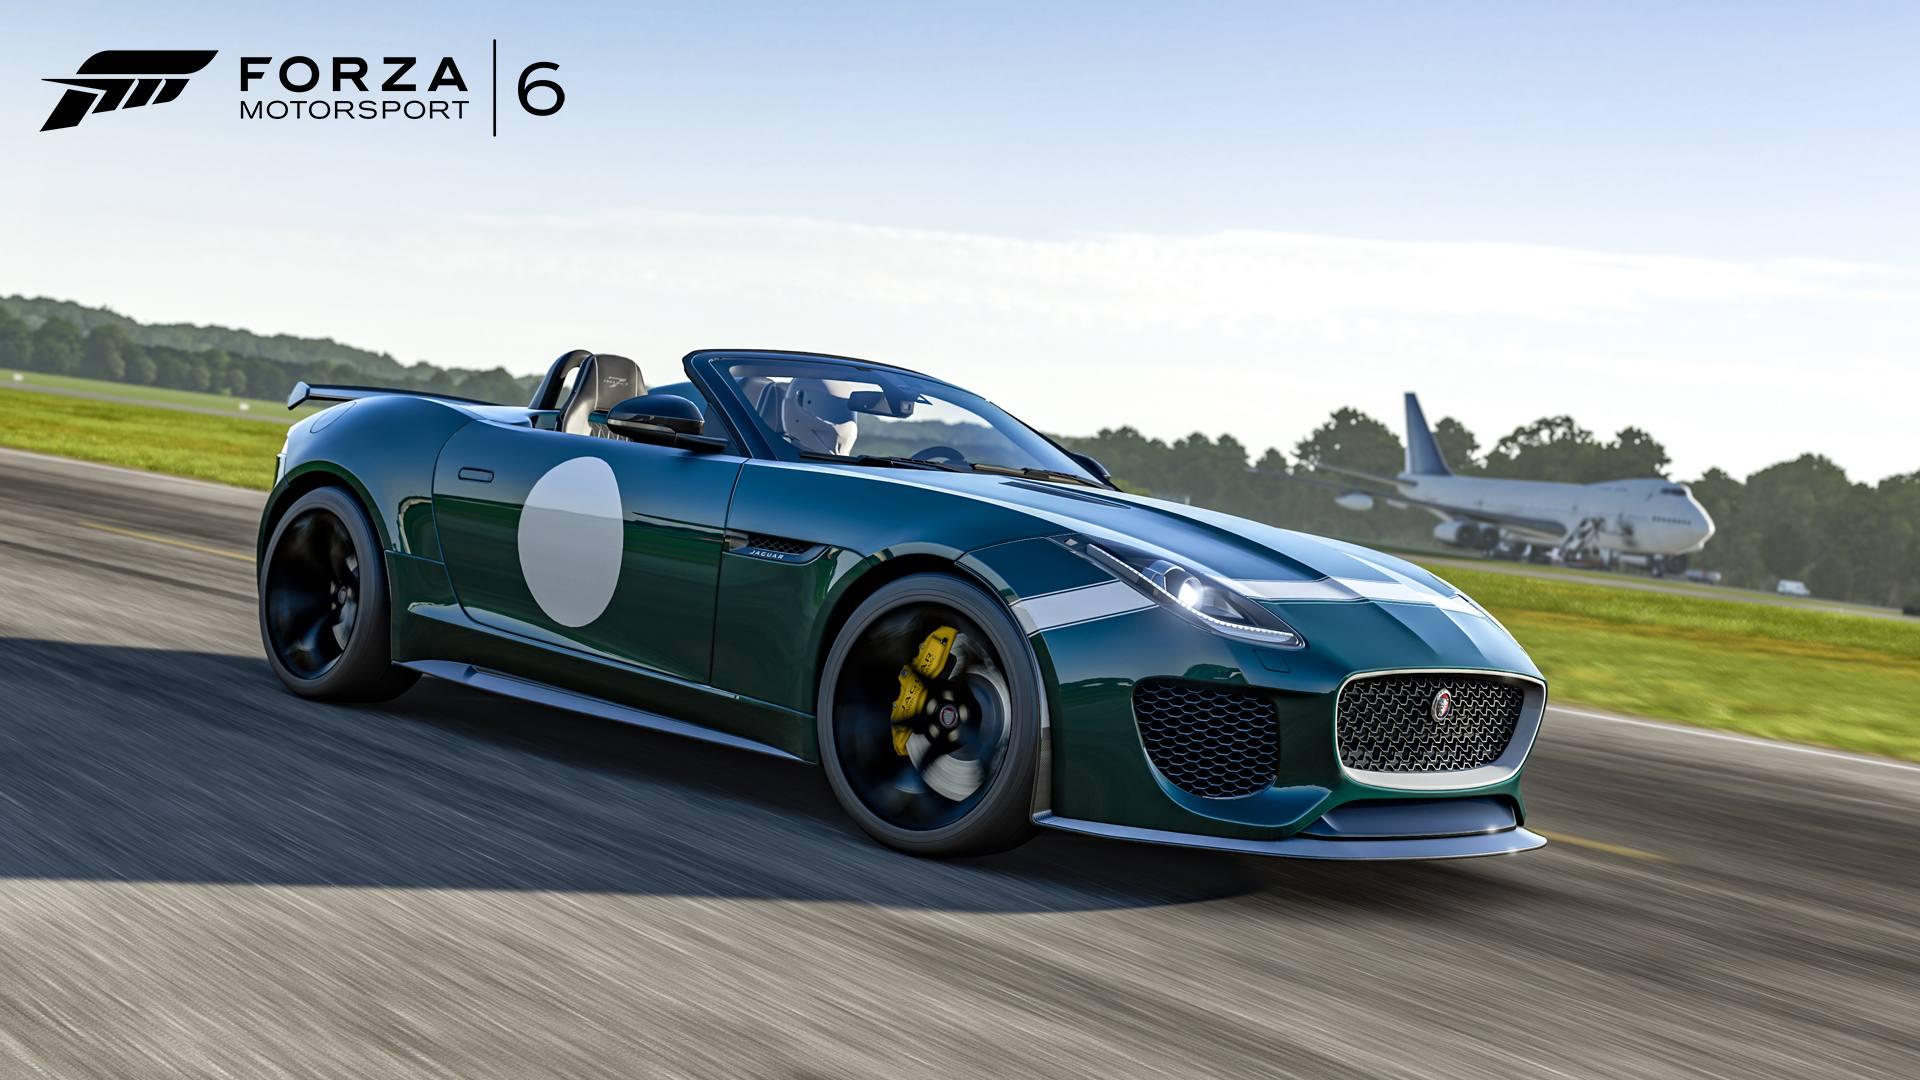 Forza Motorsport 6 2016 Jaguar F-TYPE Project 7 05-04-16 001